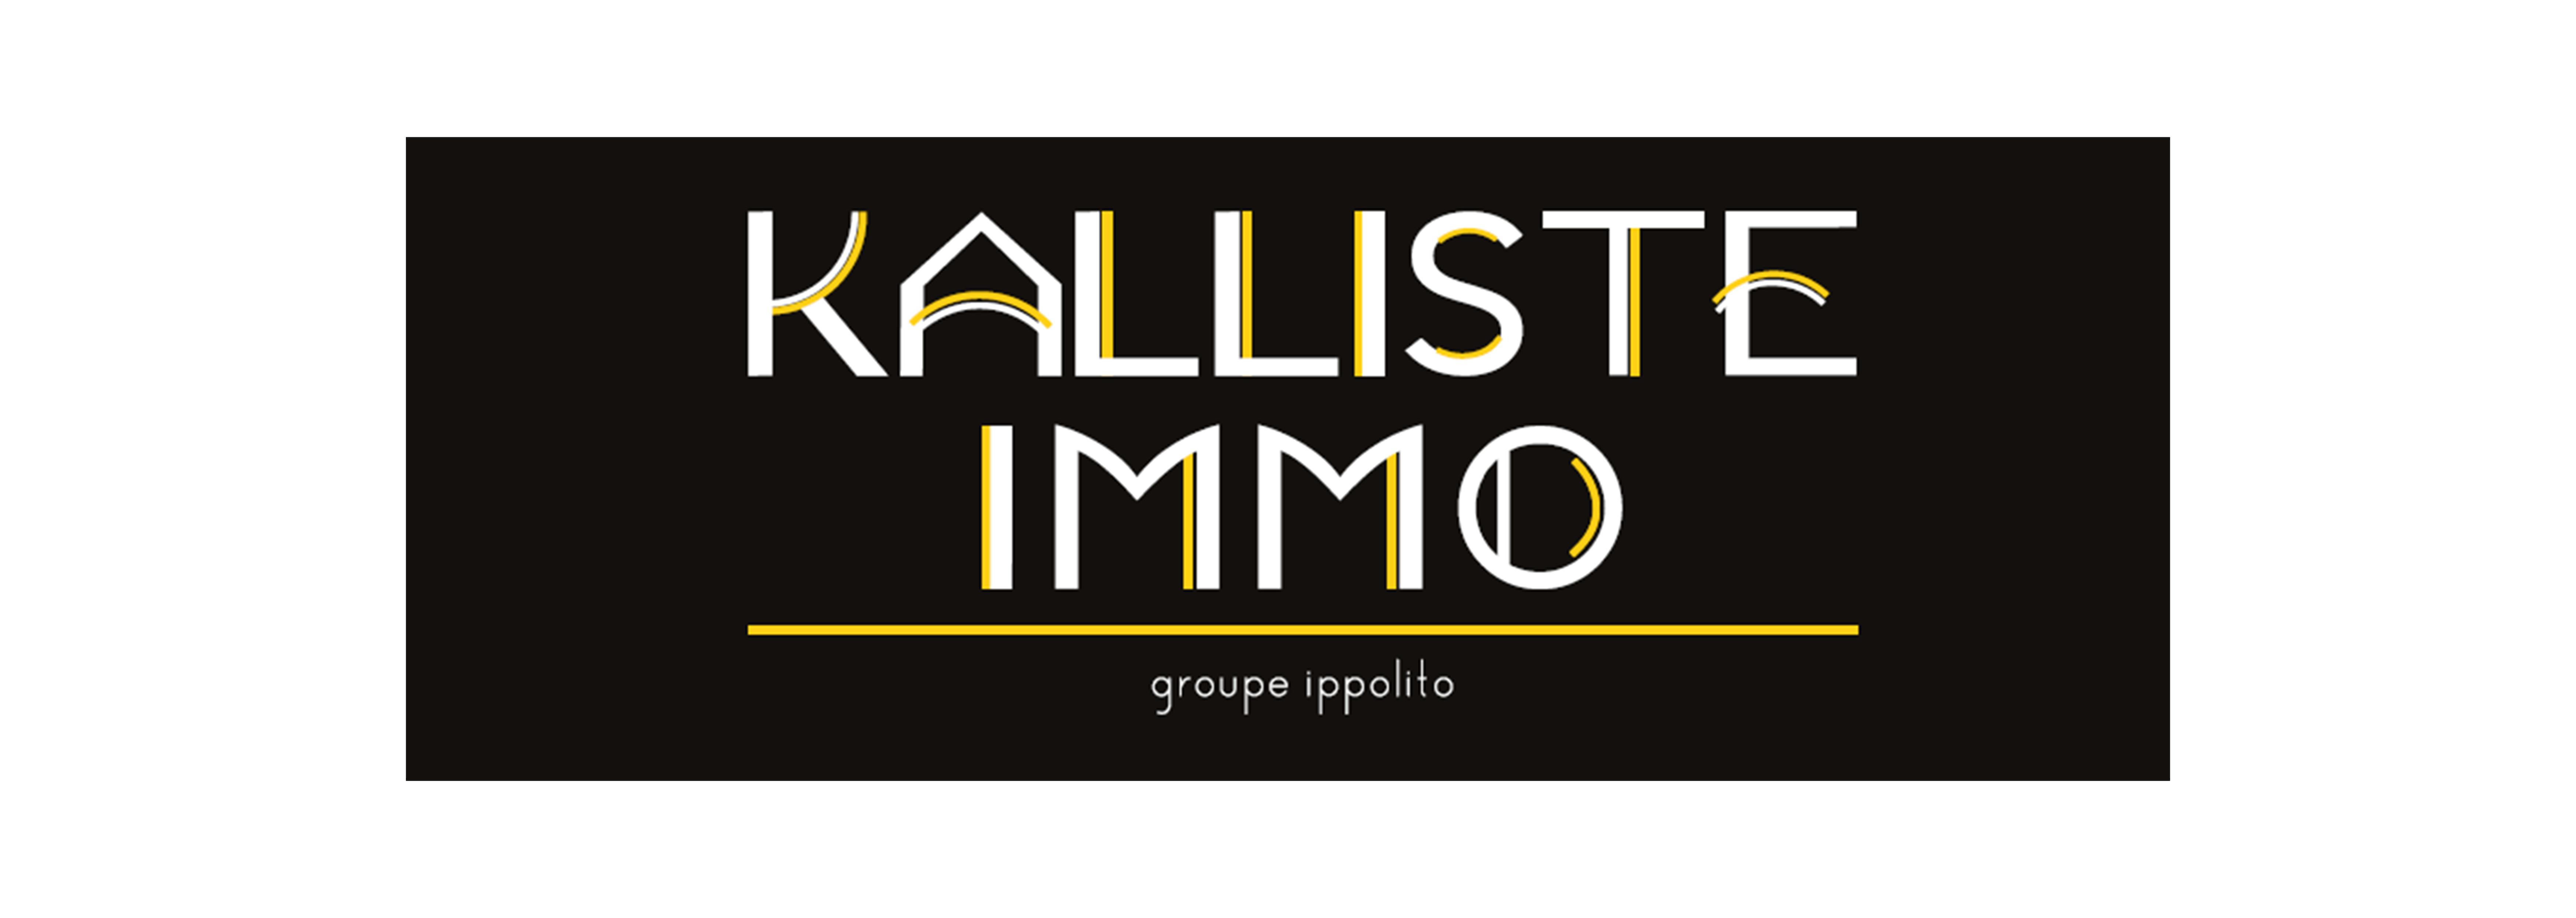 logo kalliste immo